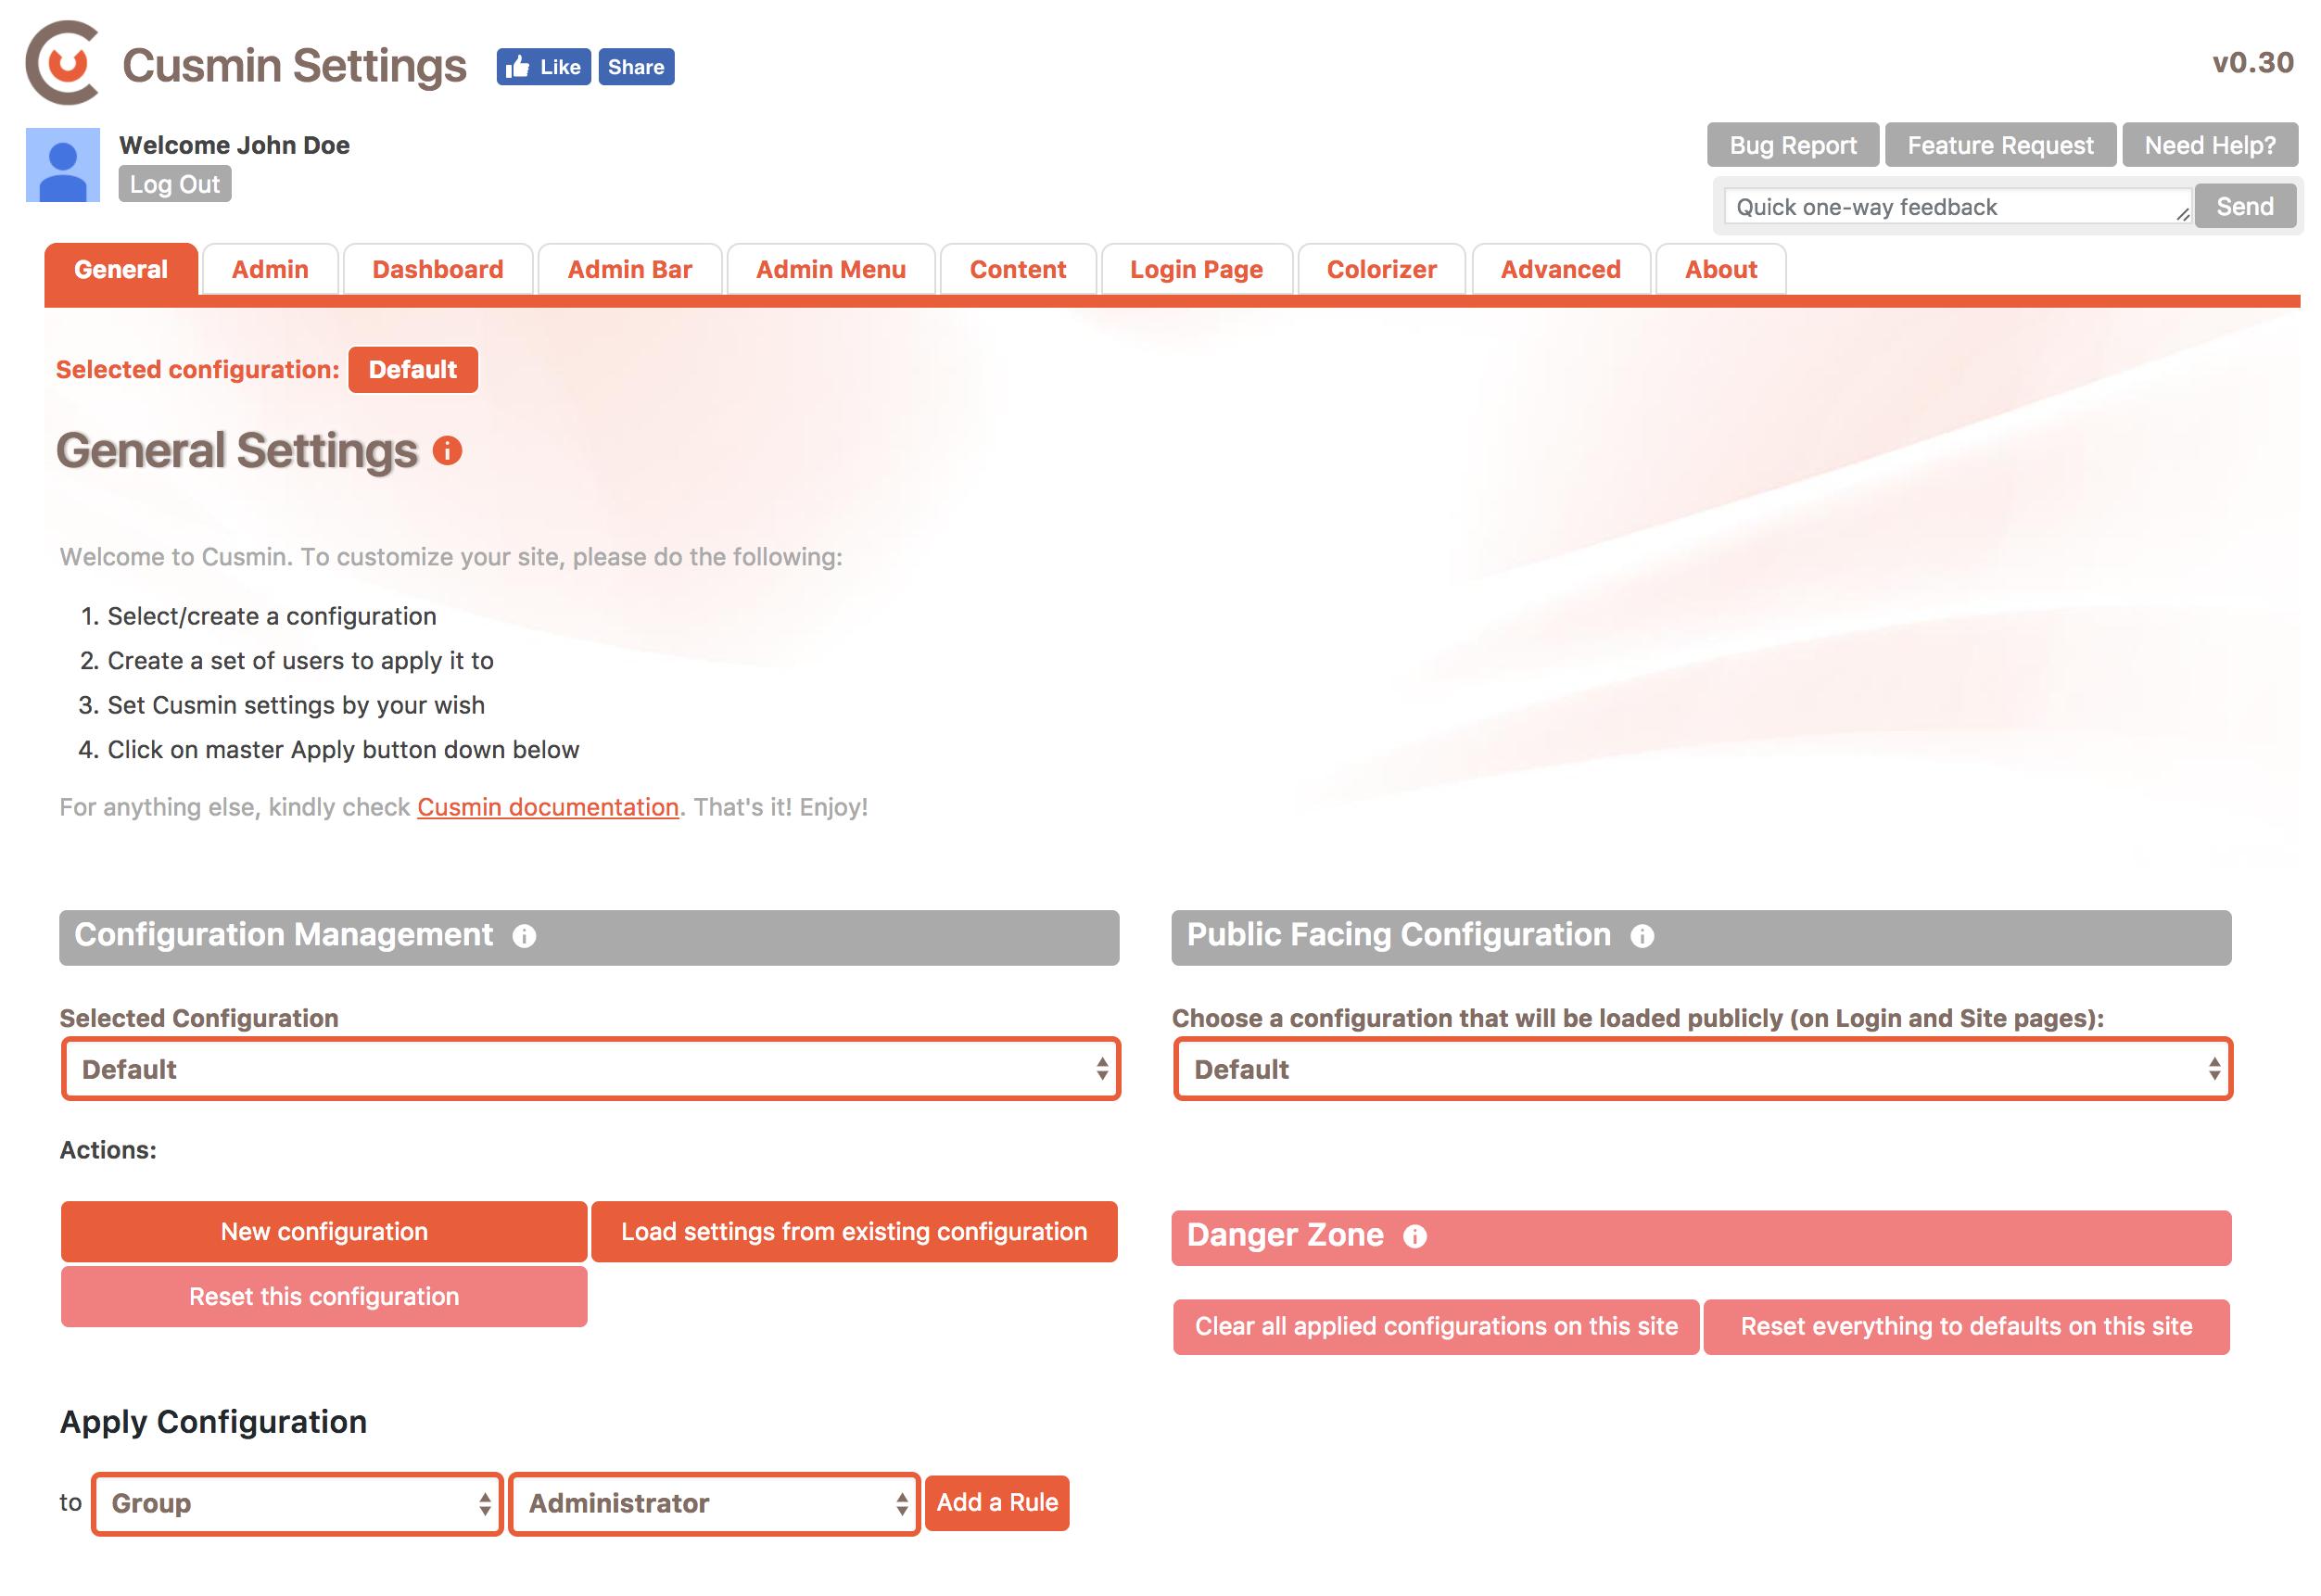 Cusmin Settings Page showing General tab settings